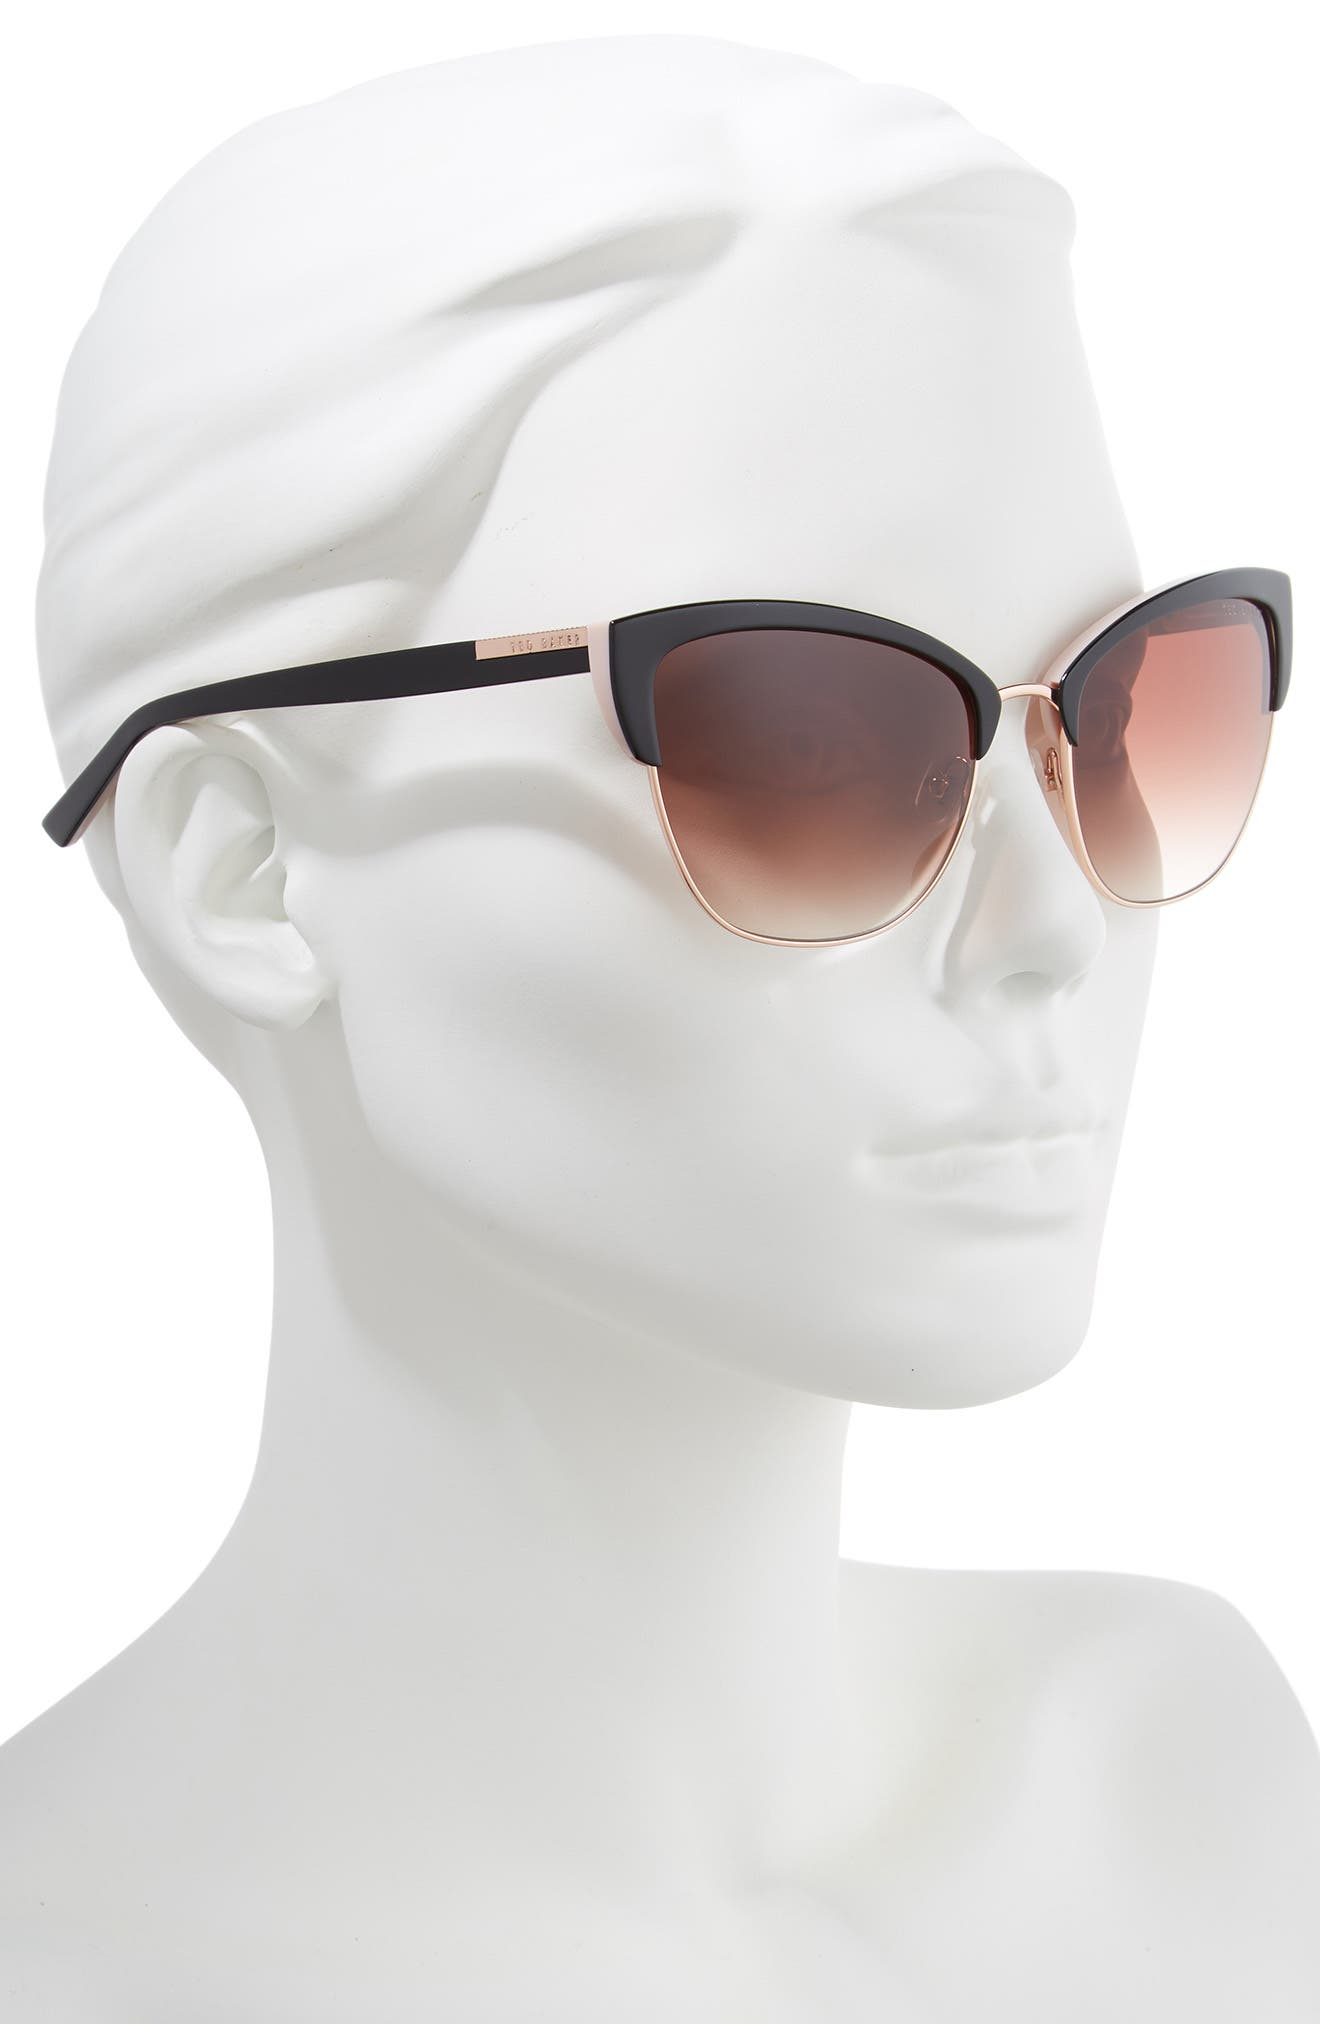 57mm Cat Eye Sunglasses,                             Alternate thumbnail 2, color,                             BLACK